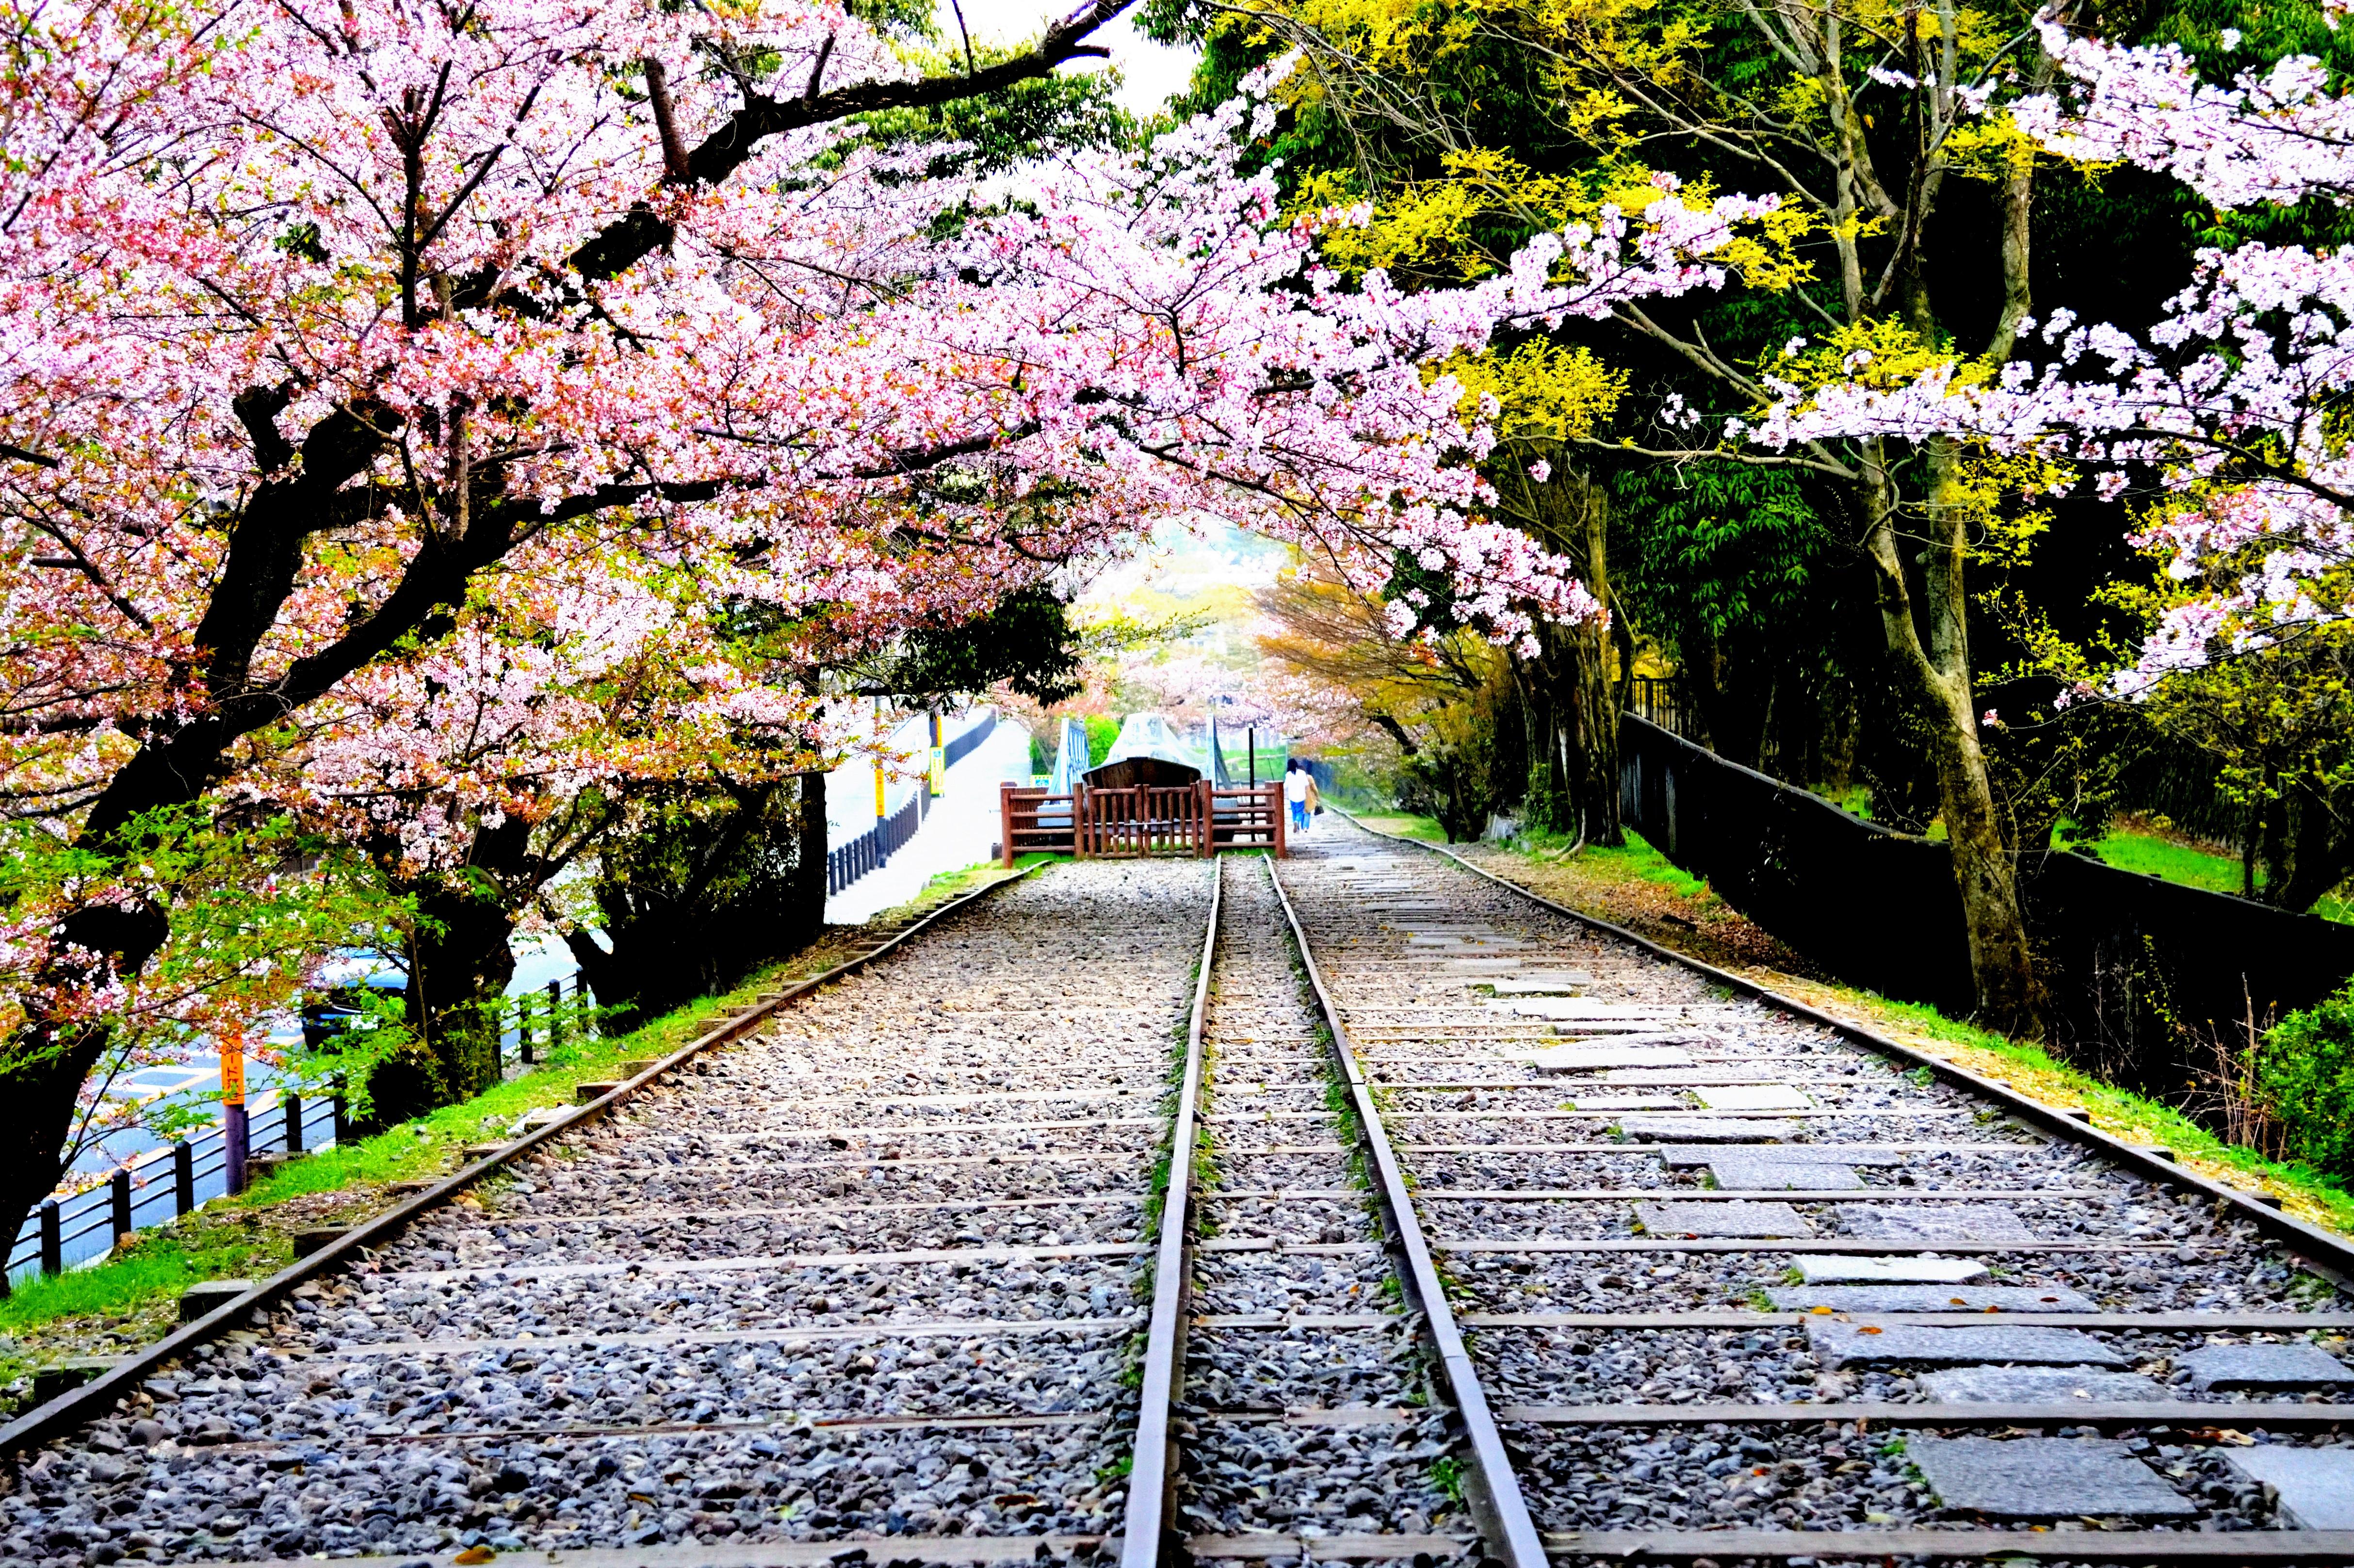 Railway and cherry trees